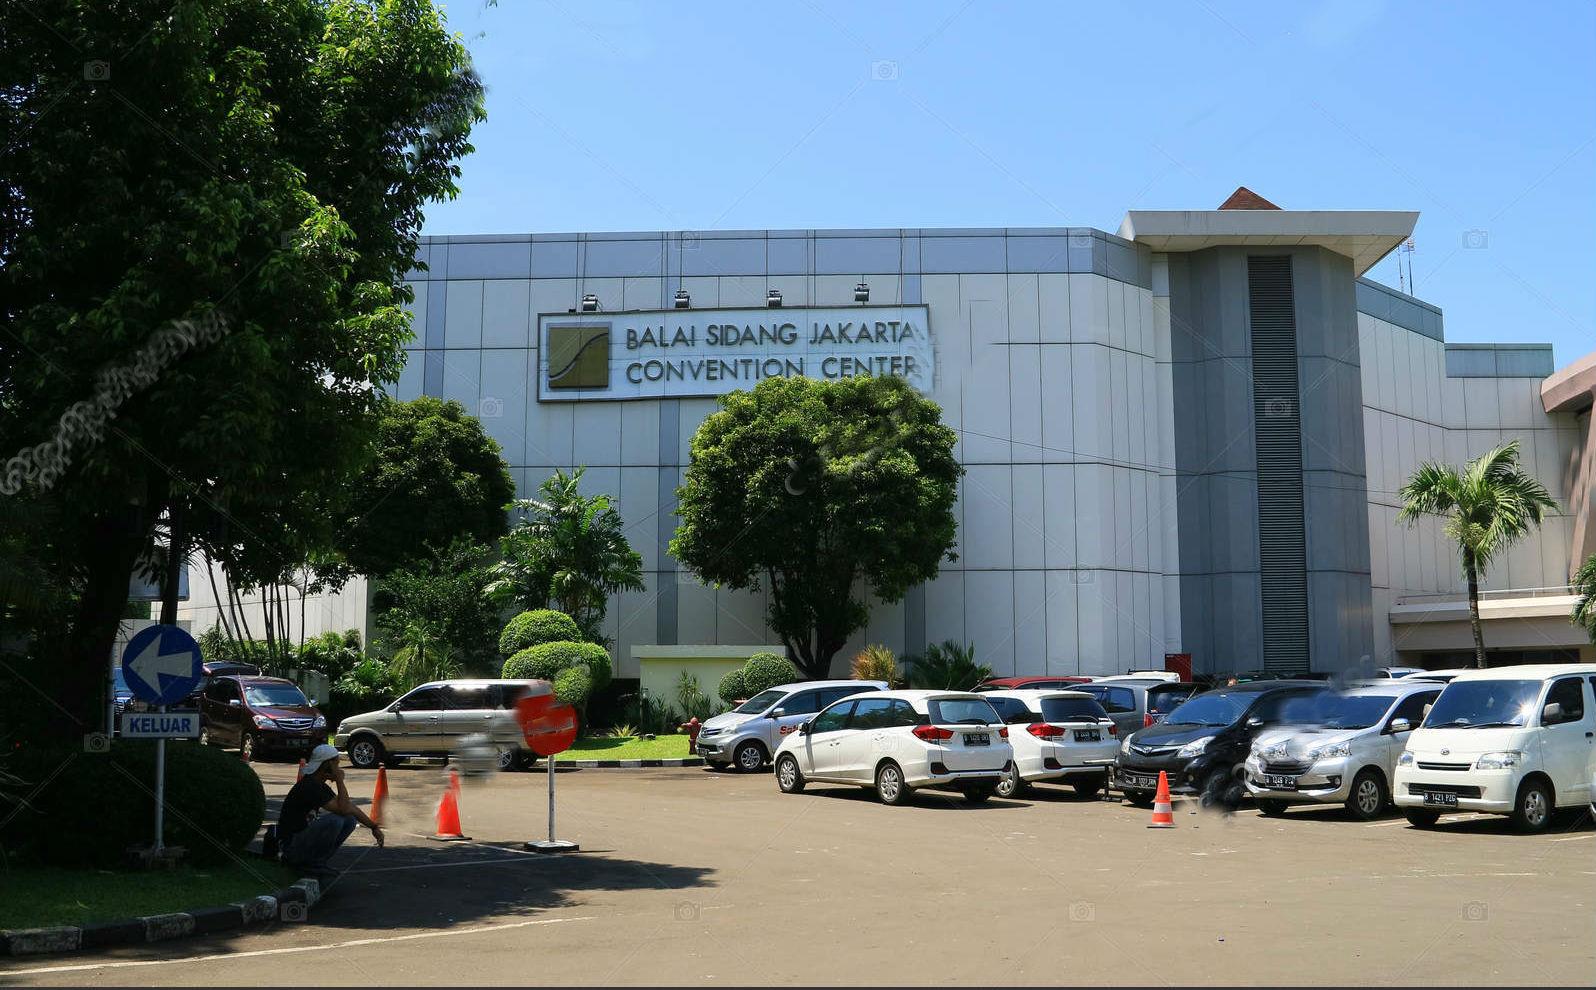 雅加达会议中心Jakarta Convention Center (JCC)